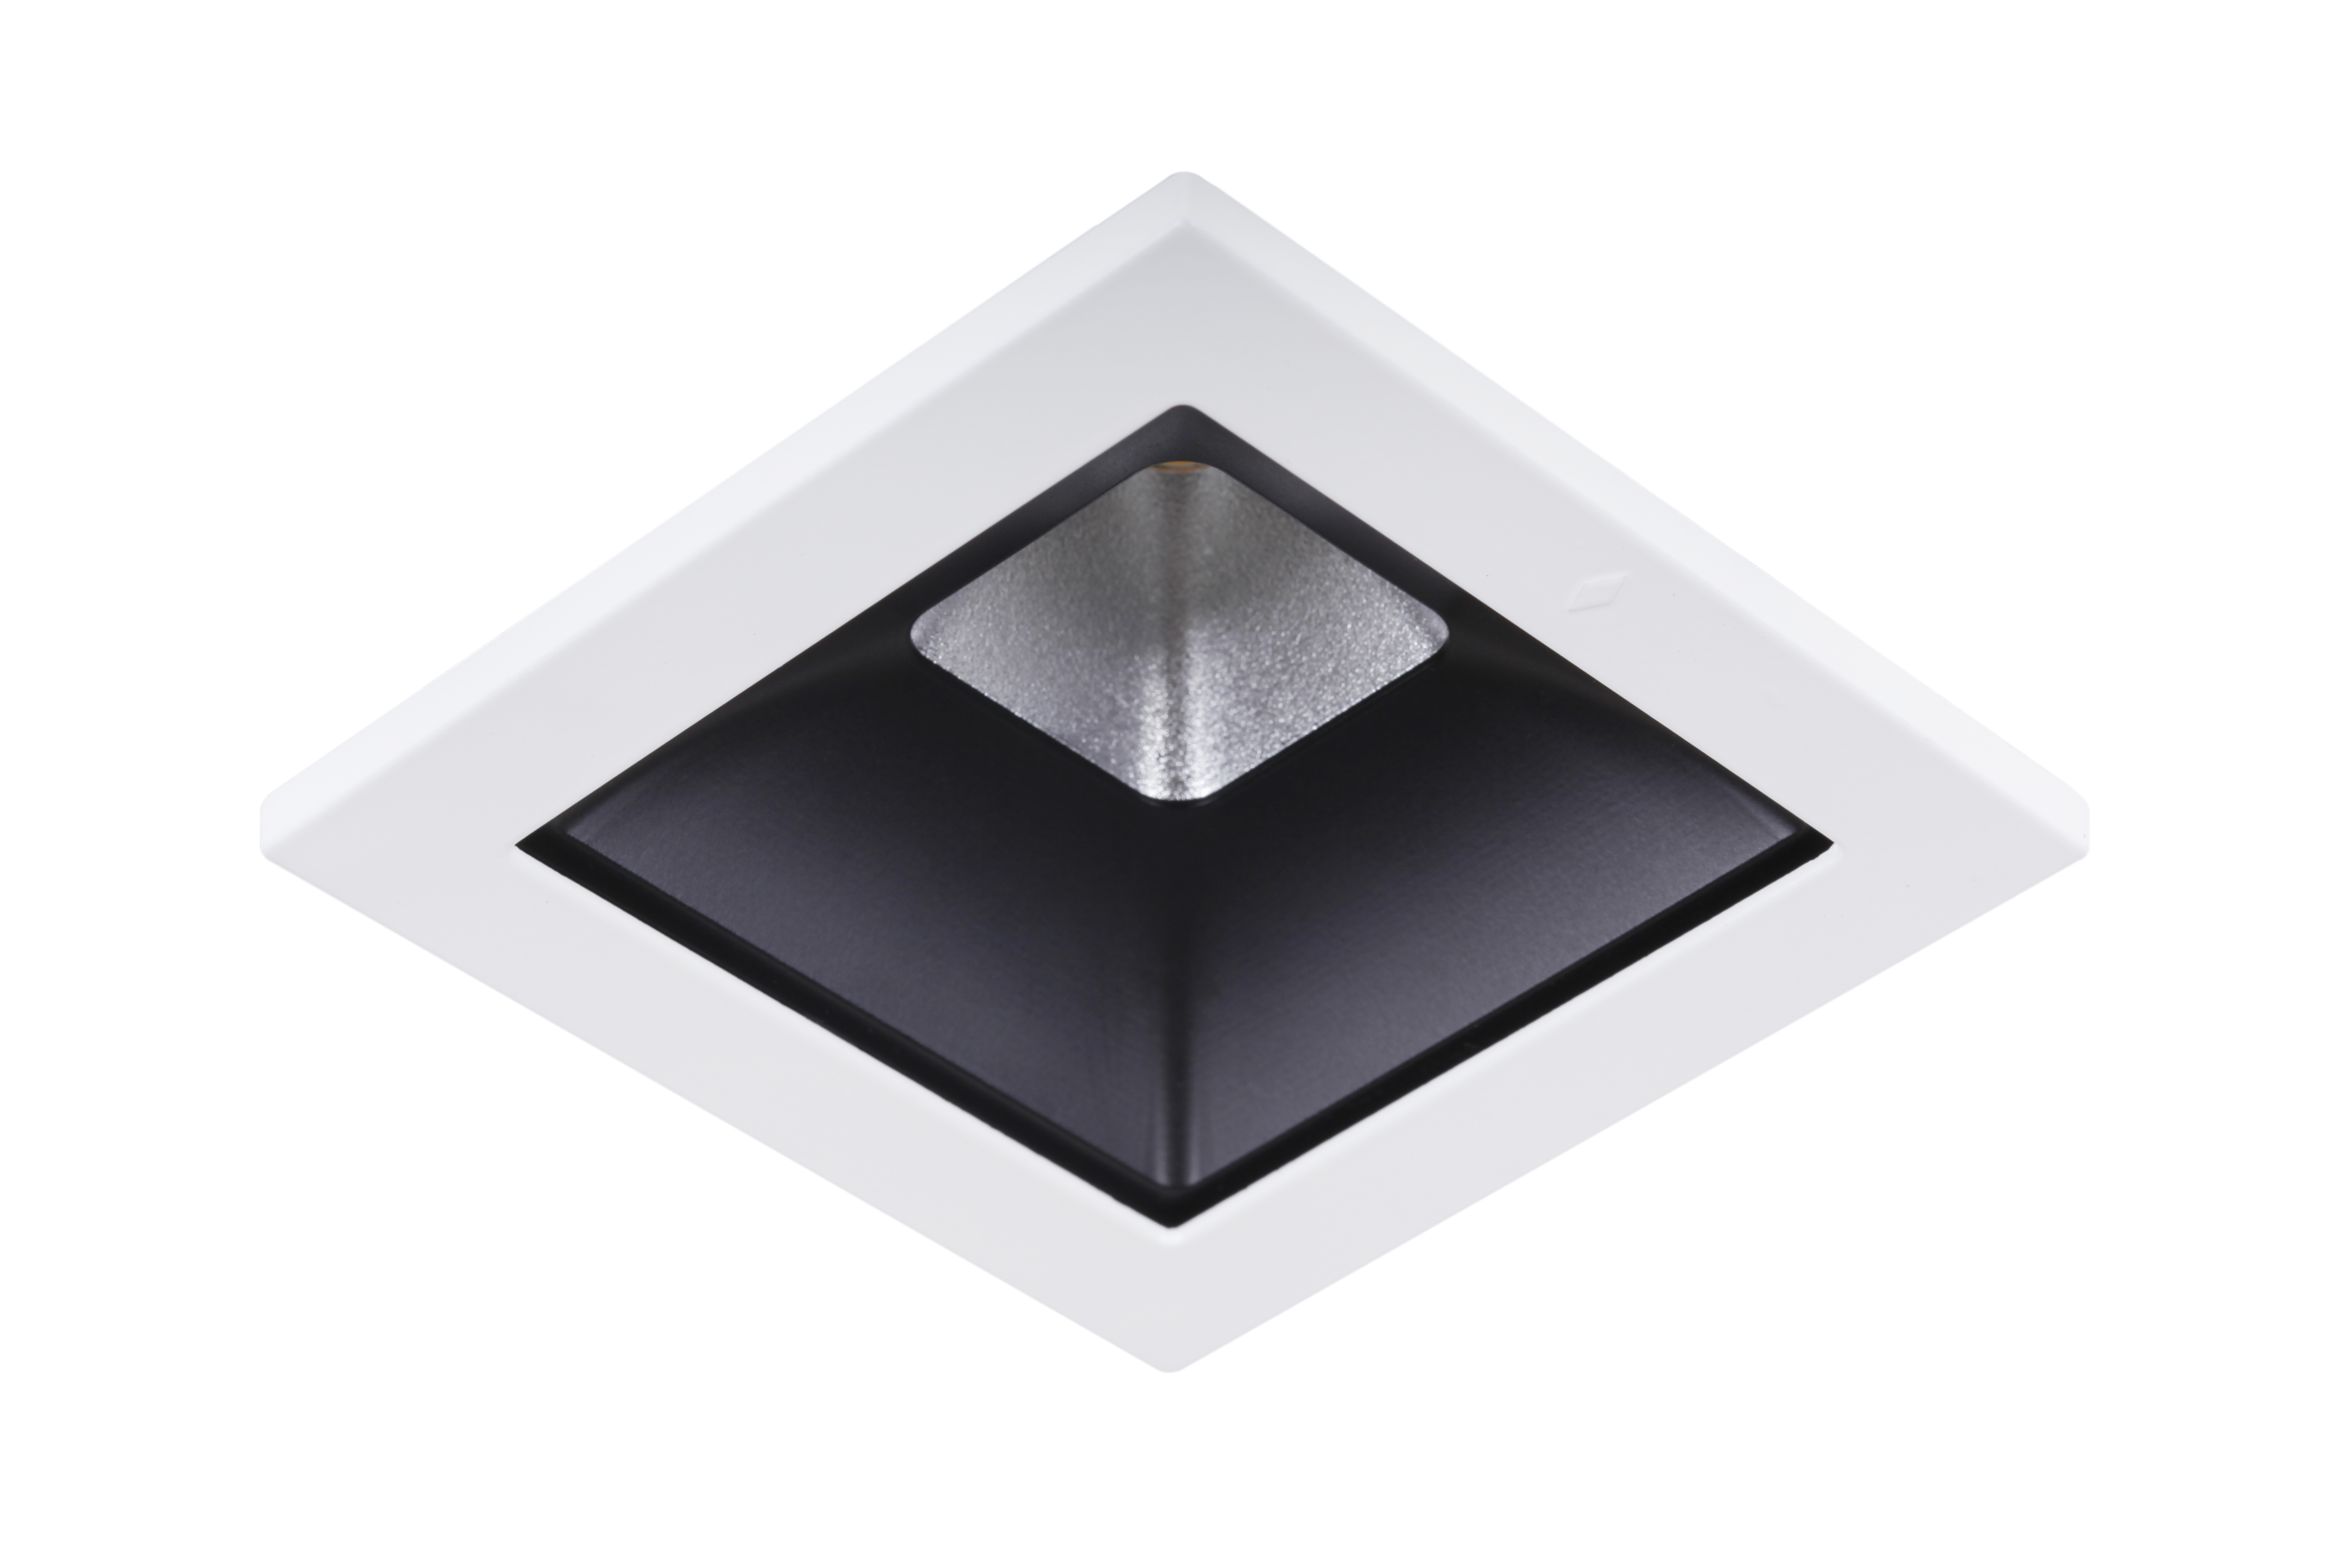 Concord Myriad quadrat. LED 15W 830 48° DALI Refl. schwarz Rahmen ...